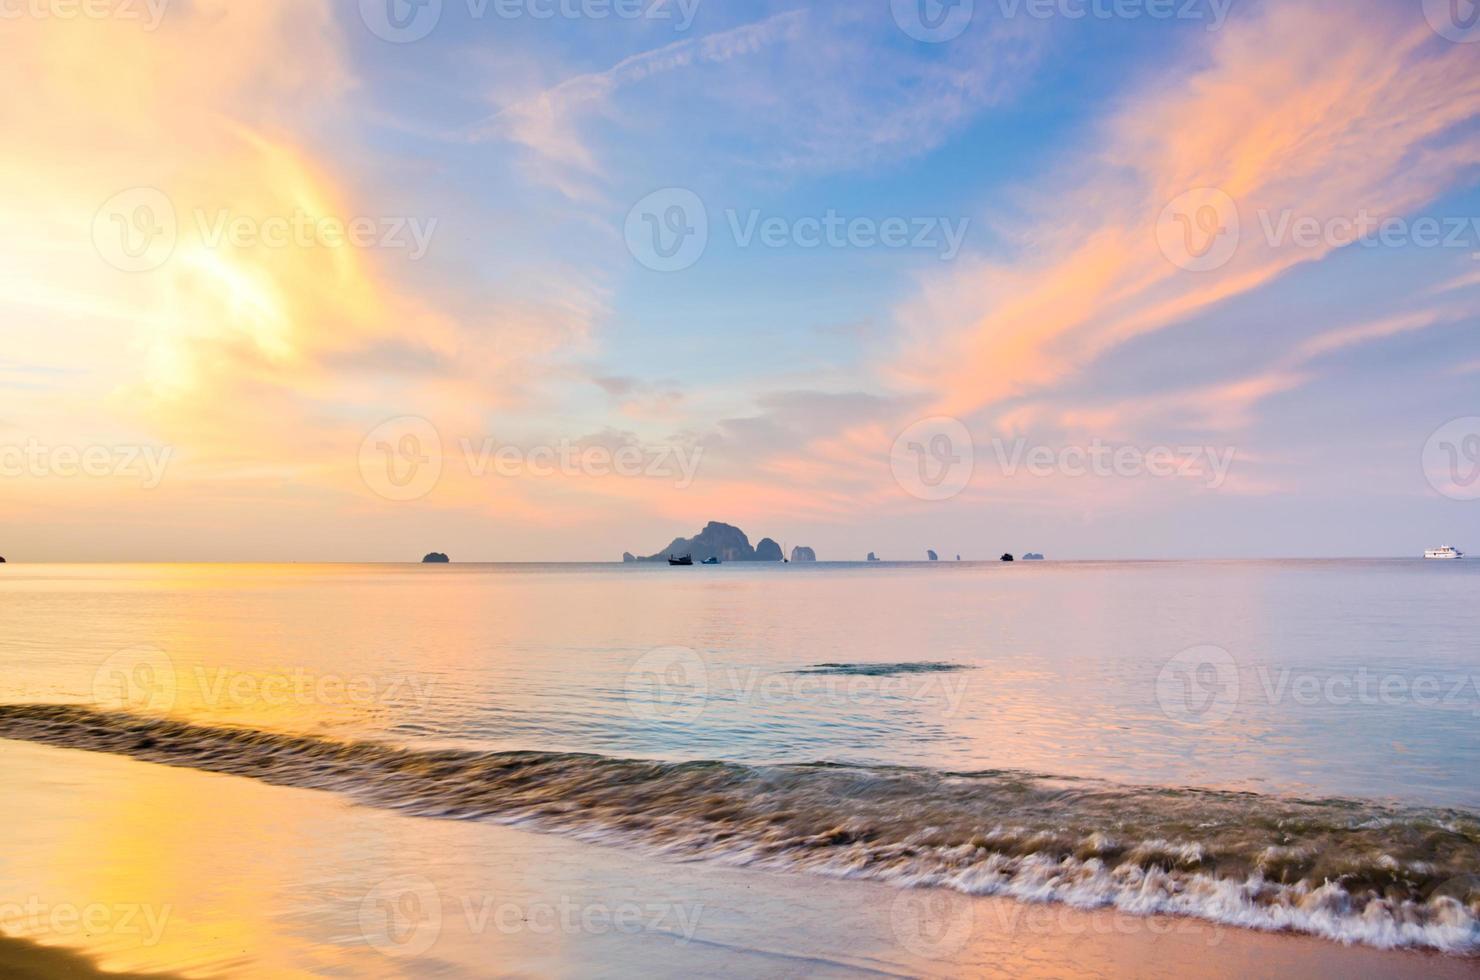 Sonnenaufgang mit Meer und Inseln bei Aonang, Krabi foto